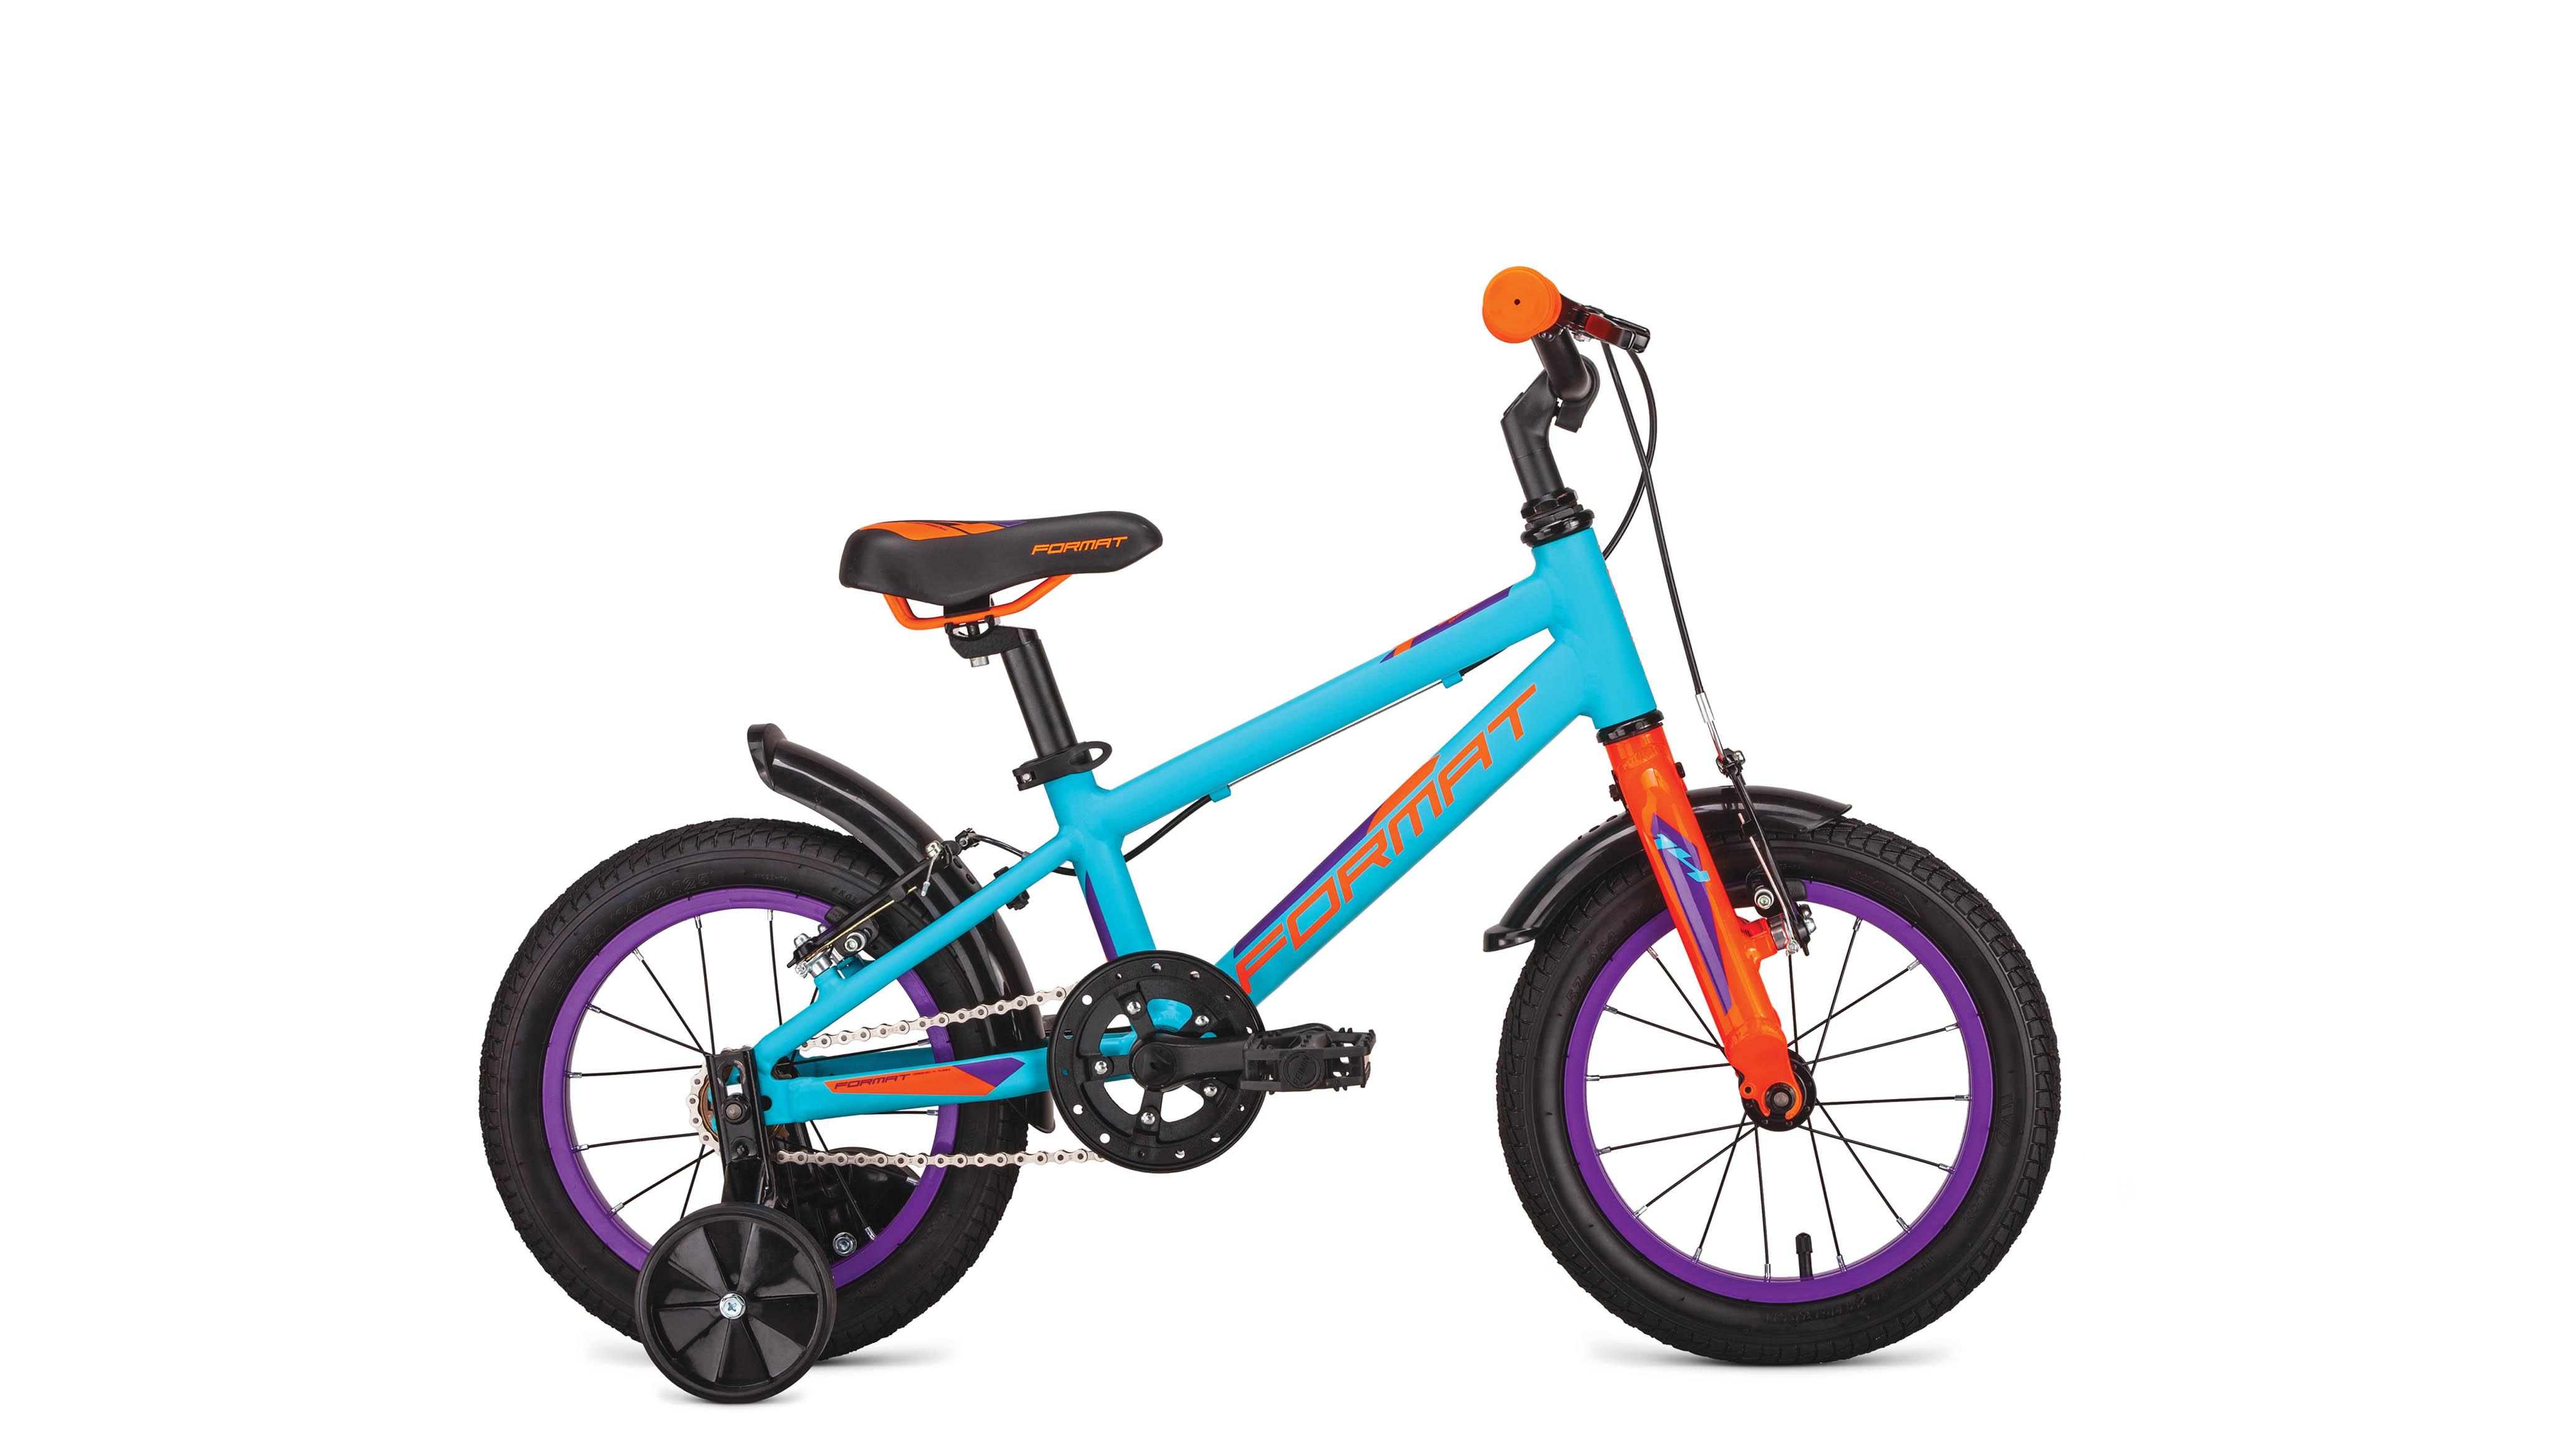 Велосипед FORMAT Kids 14 2019 зеленый one size